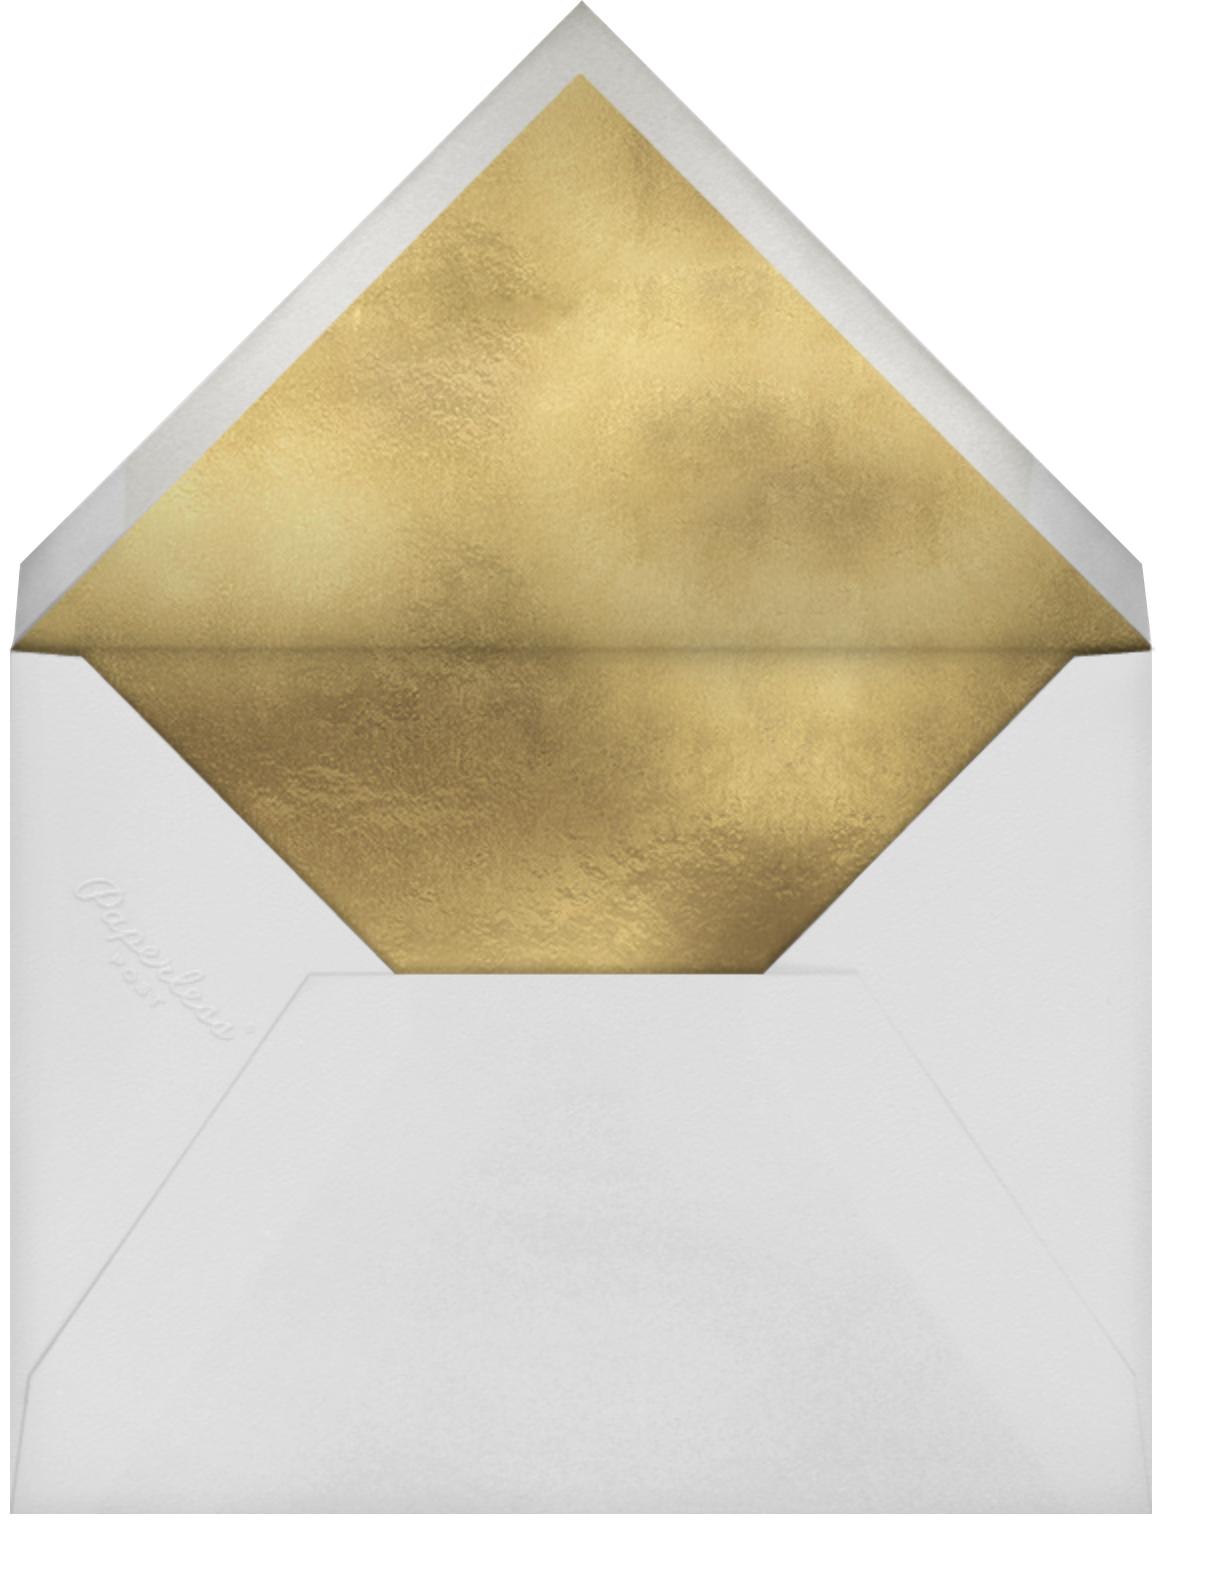 Embossed Daisies - Mint - kate spade new york - General entertaining - envelope back